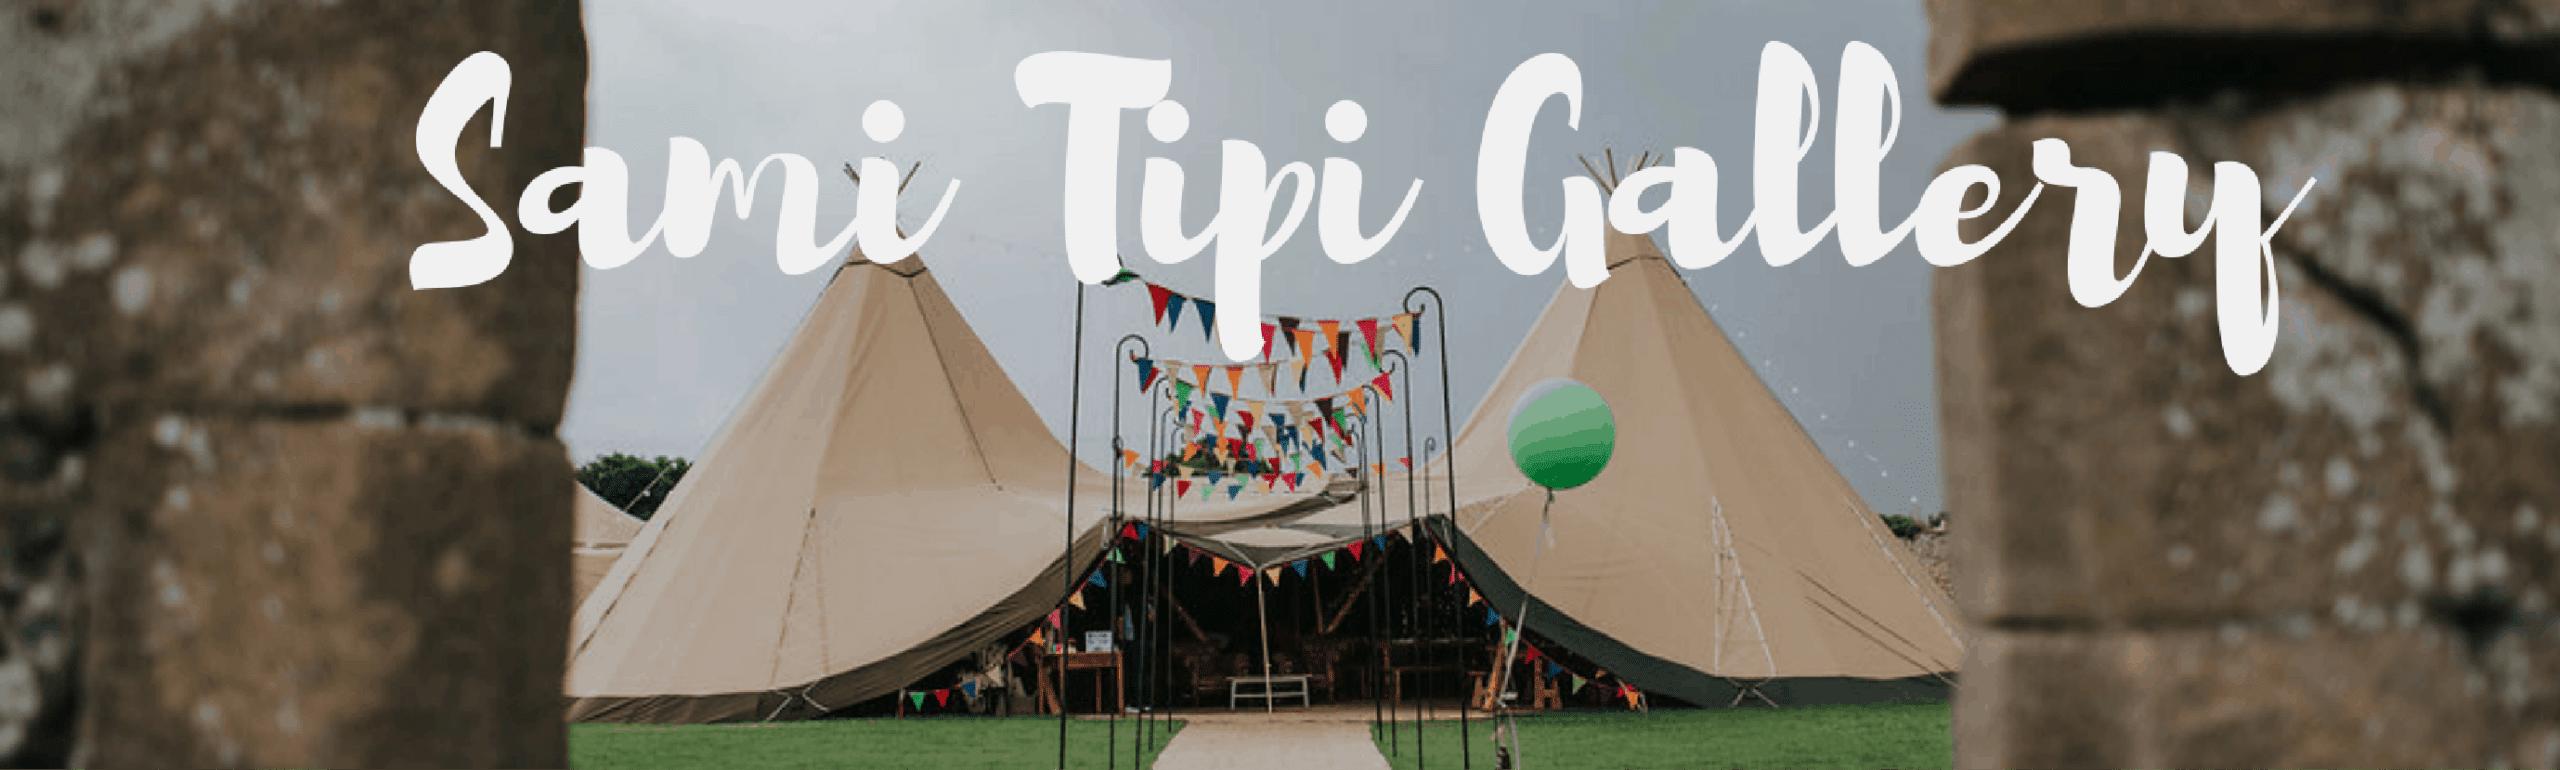 Sami Tipi Event Gallery - a place for inspiration